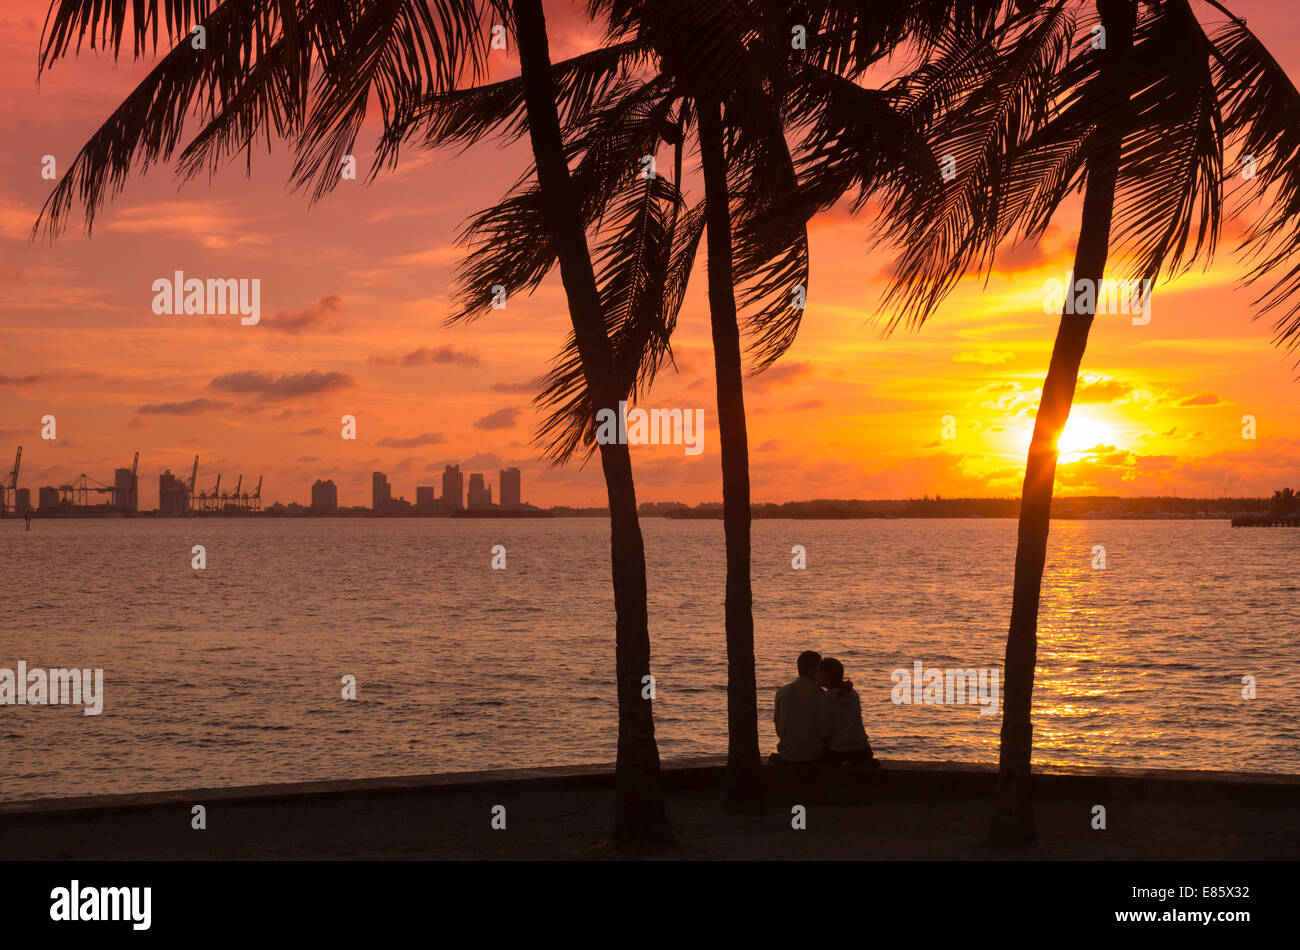 PALM TREES COUPLE SITTING MIAMI BEACH PORT OF SKYLINE BISCAYNE BAY FLORIDA USA